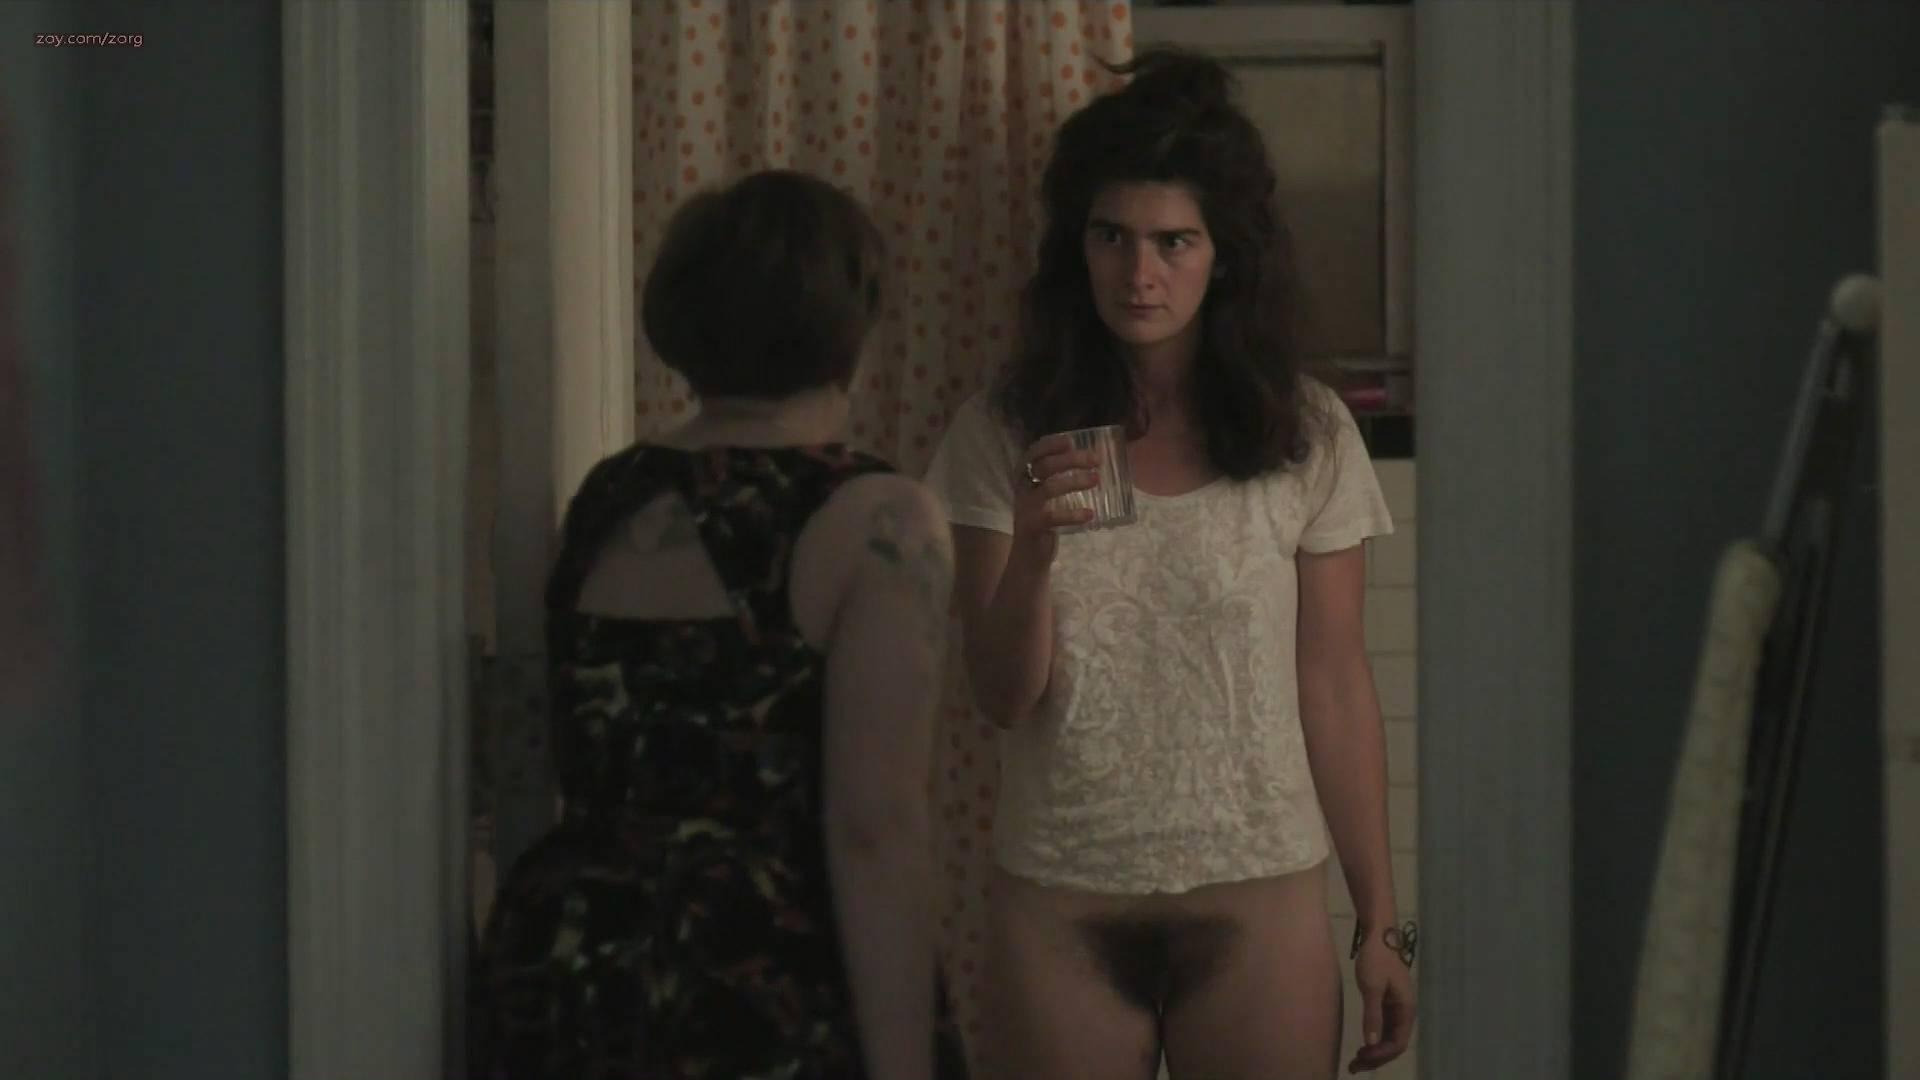 Brevard 321 naked girls thread Gaby Hoffmann Nude Full Frontal Bush Girls 2014 S3e2 Hd 1080p